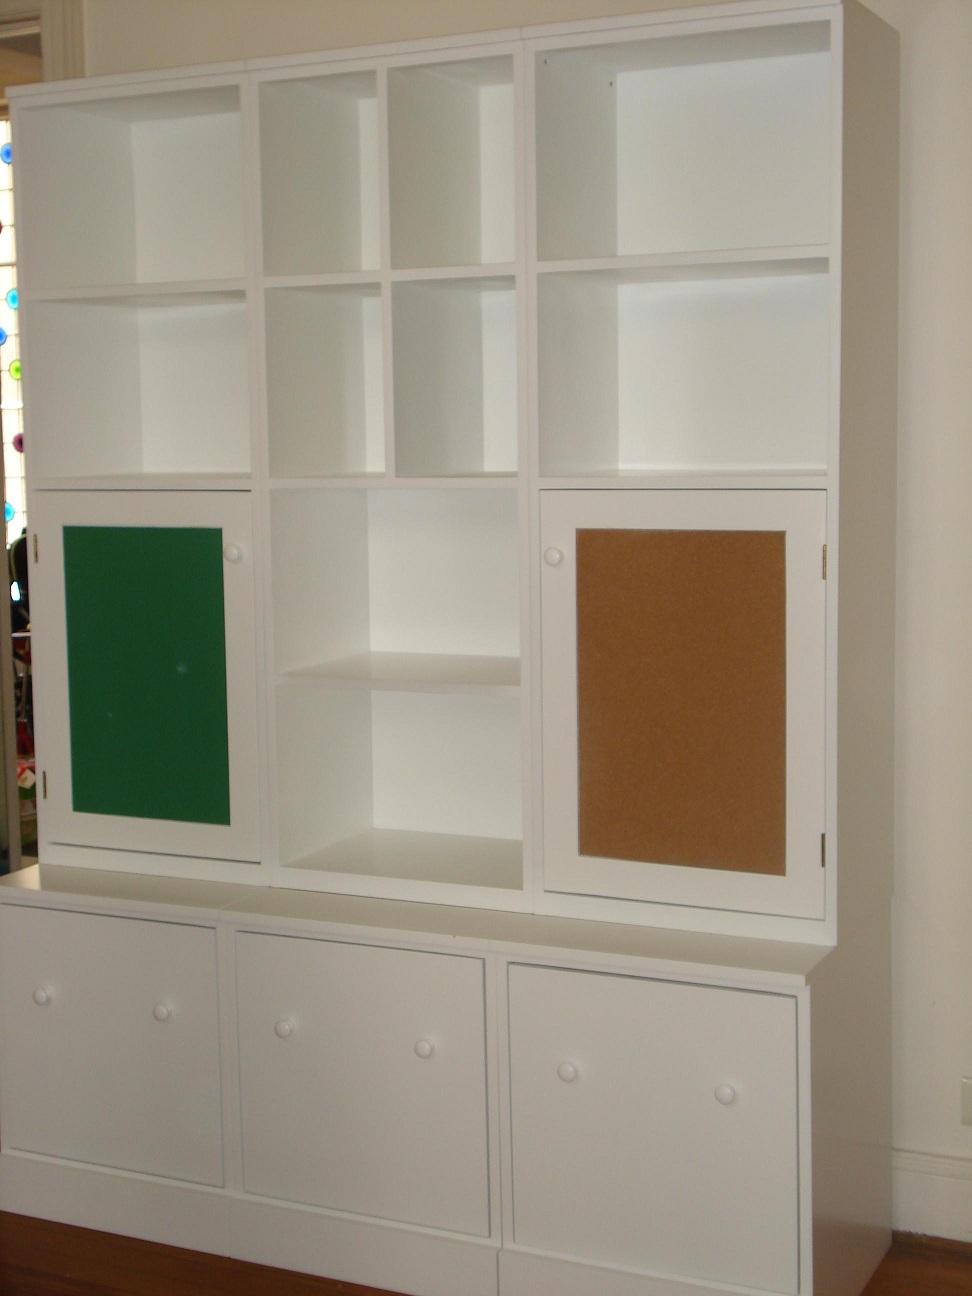 Infantiles Juveniles Bibliotecas Modulares # Muebles Laqueados